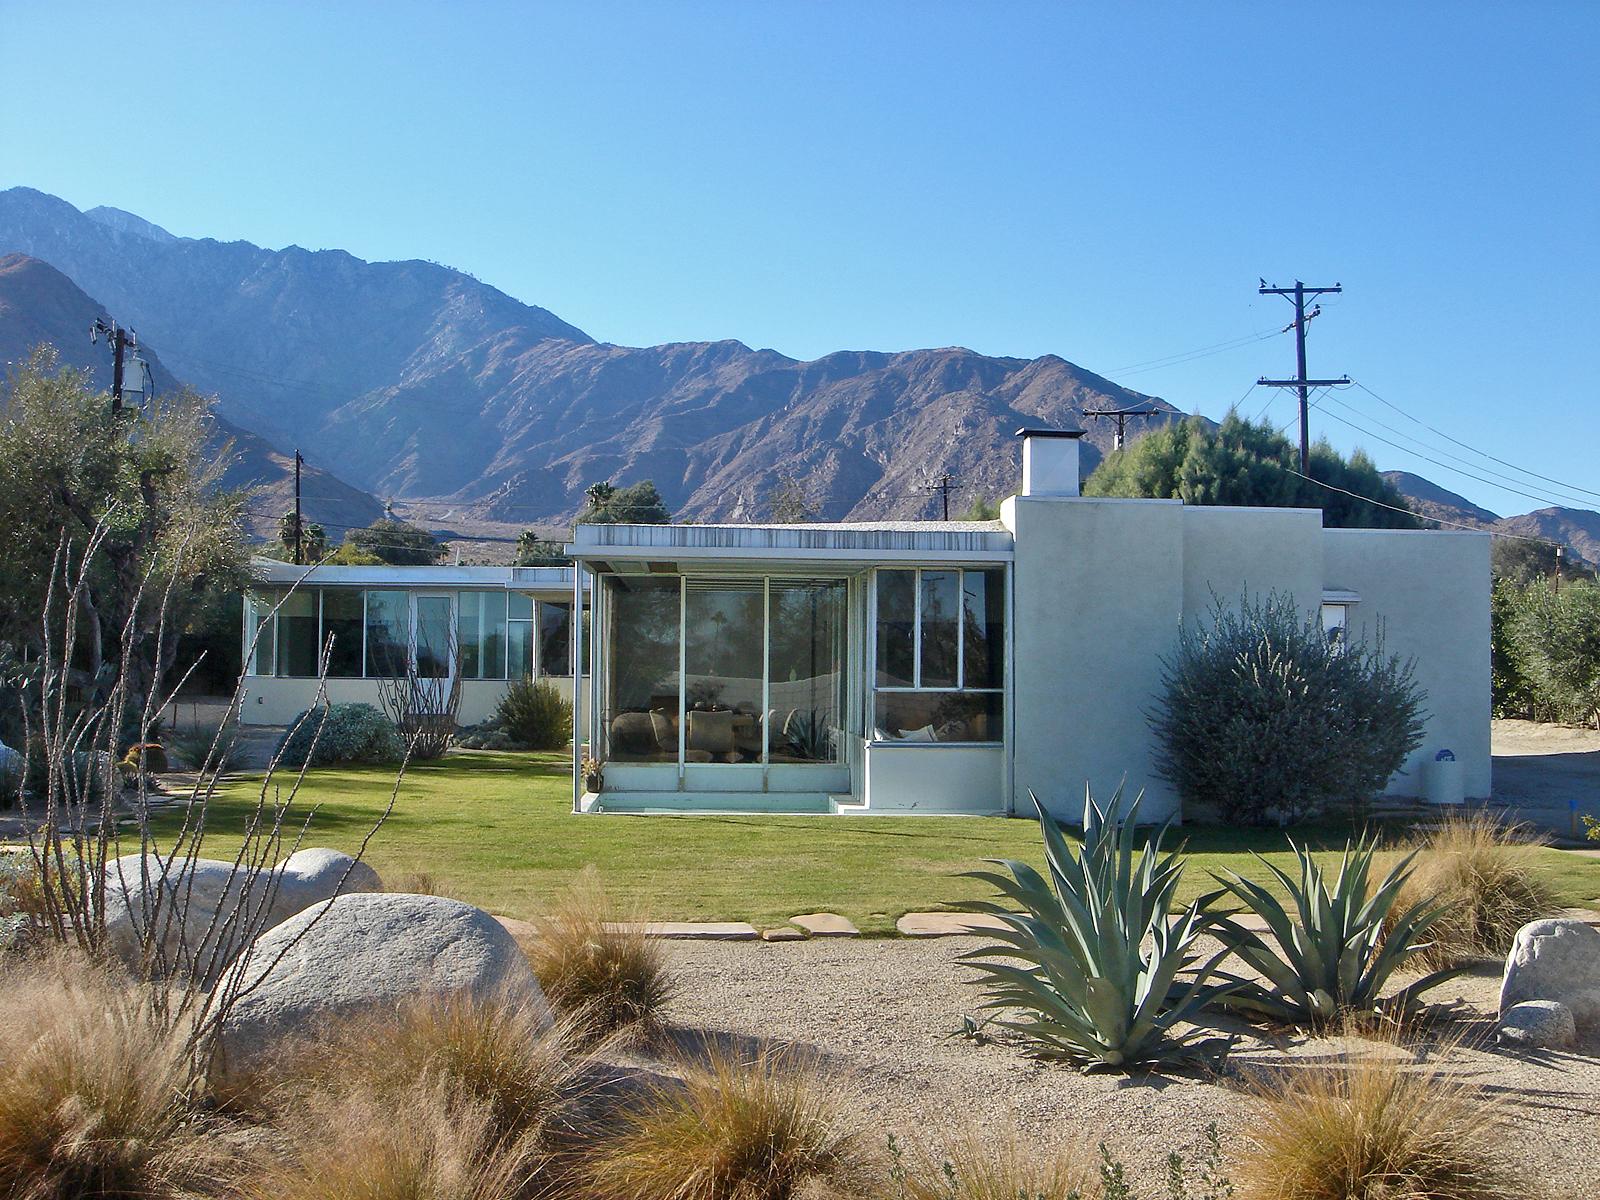 Palm Springs - Die Wüstenträume der Moderne - www.frankgayer.com size: 1600 x 1200 post ID: 7 File size: 0 B